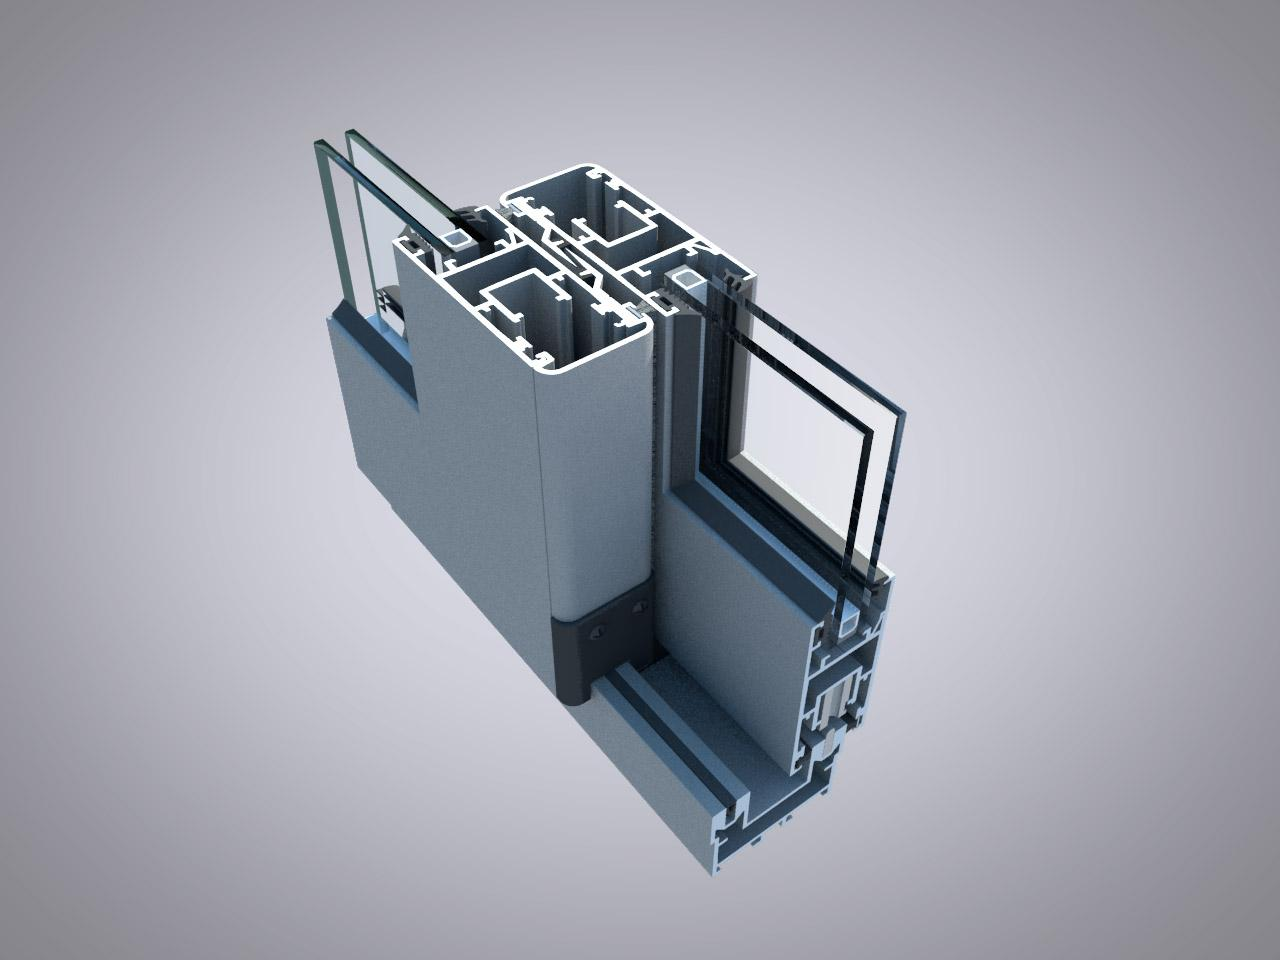 Schiebetüren - Ts-Aluminium